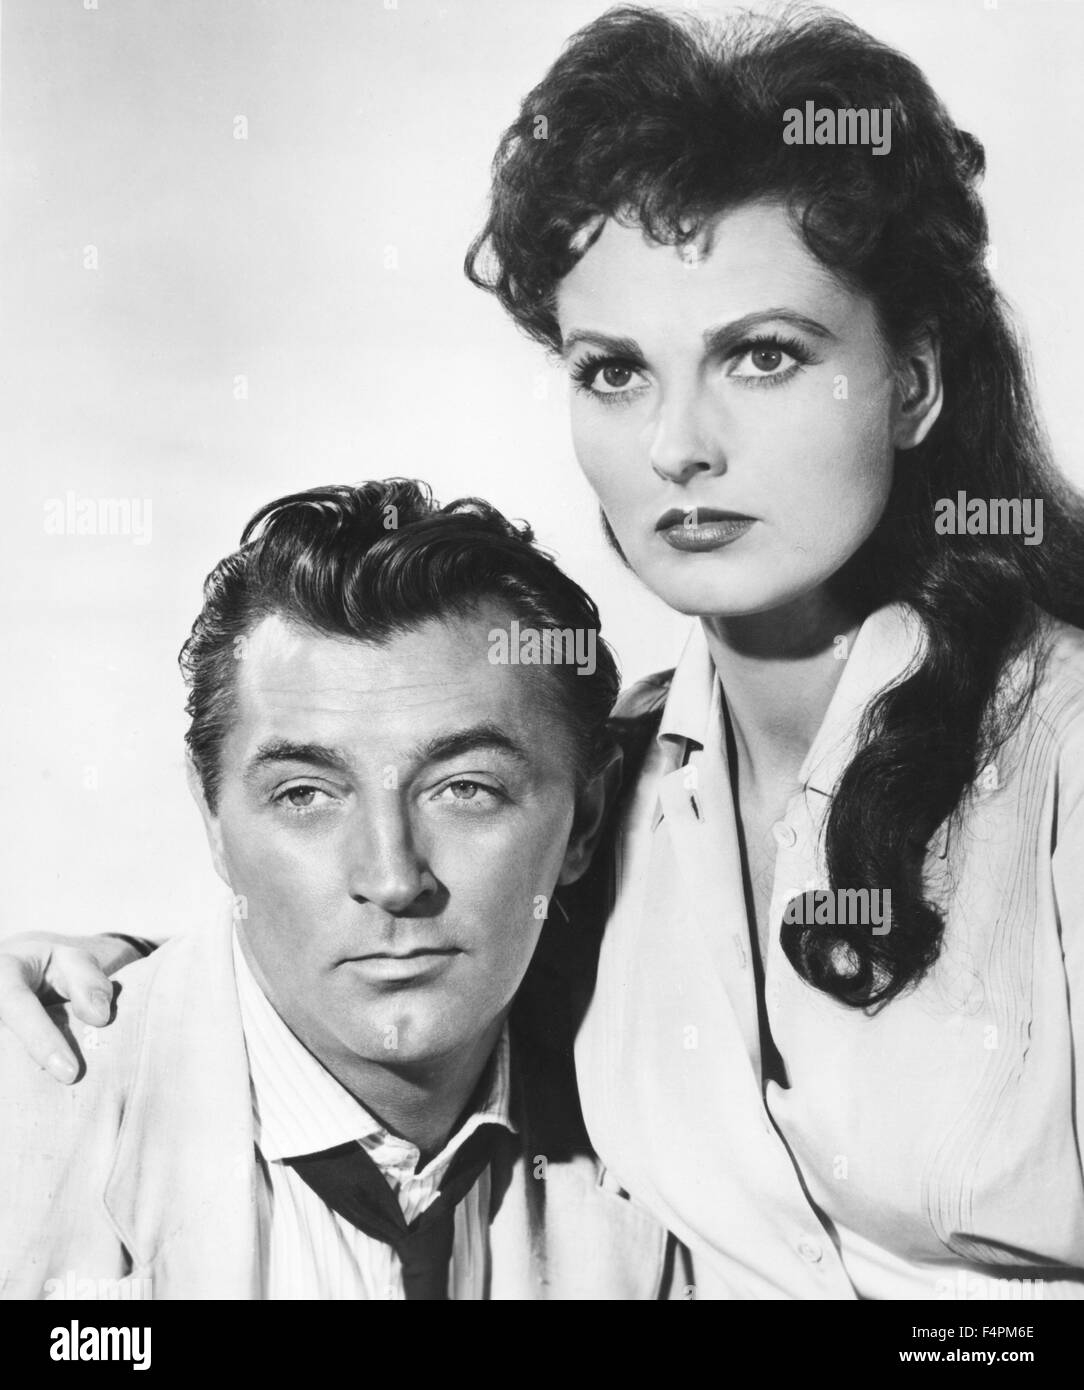 Robert Mitchum and Ursula Thiess / Bandido / 1956 directed by Richard Fleischer [United Artists] - Stock Image